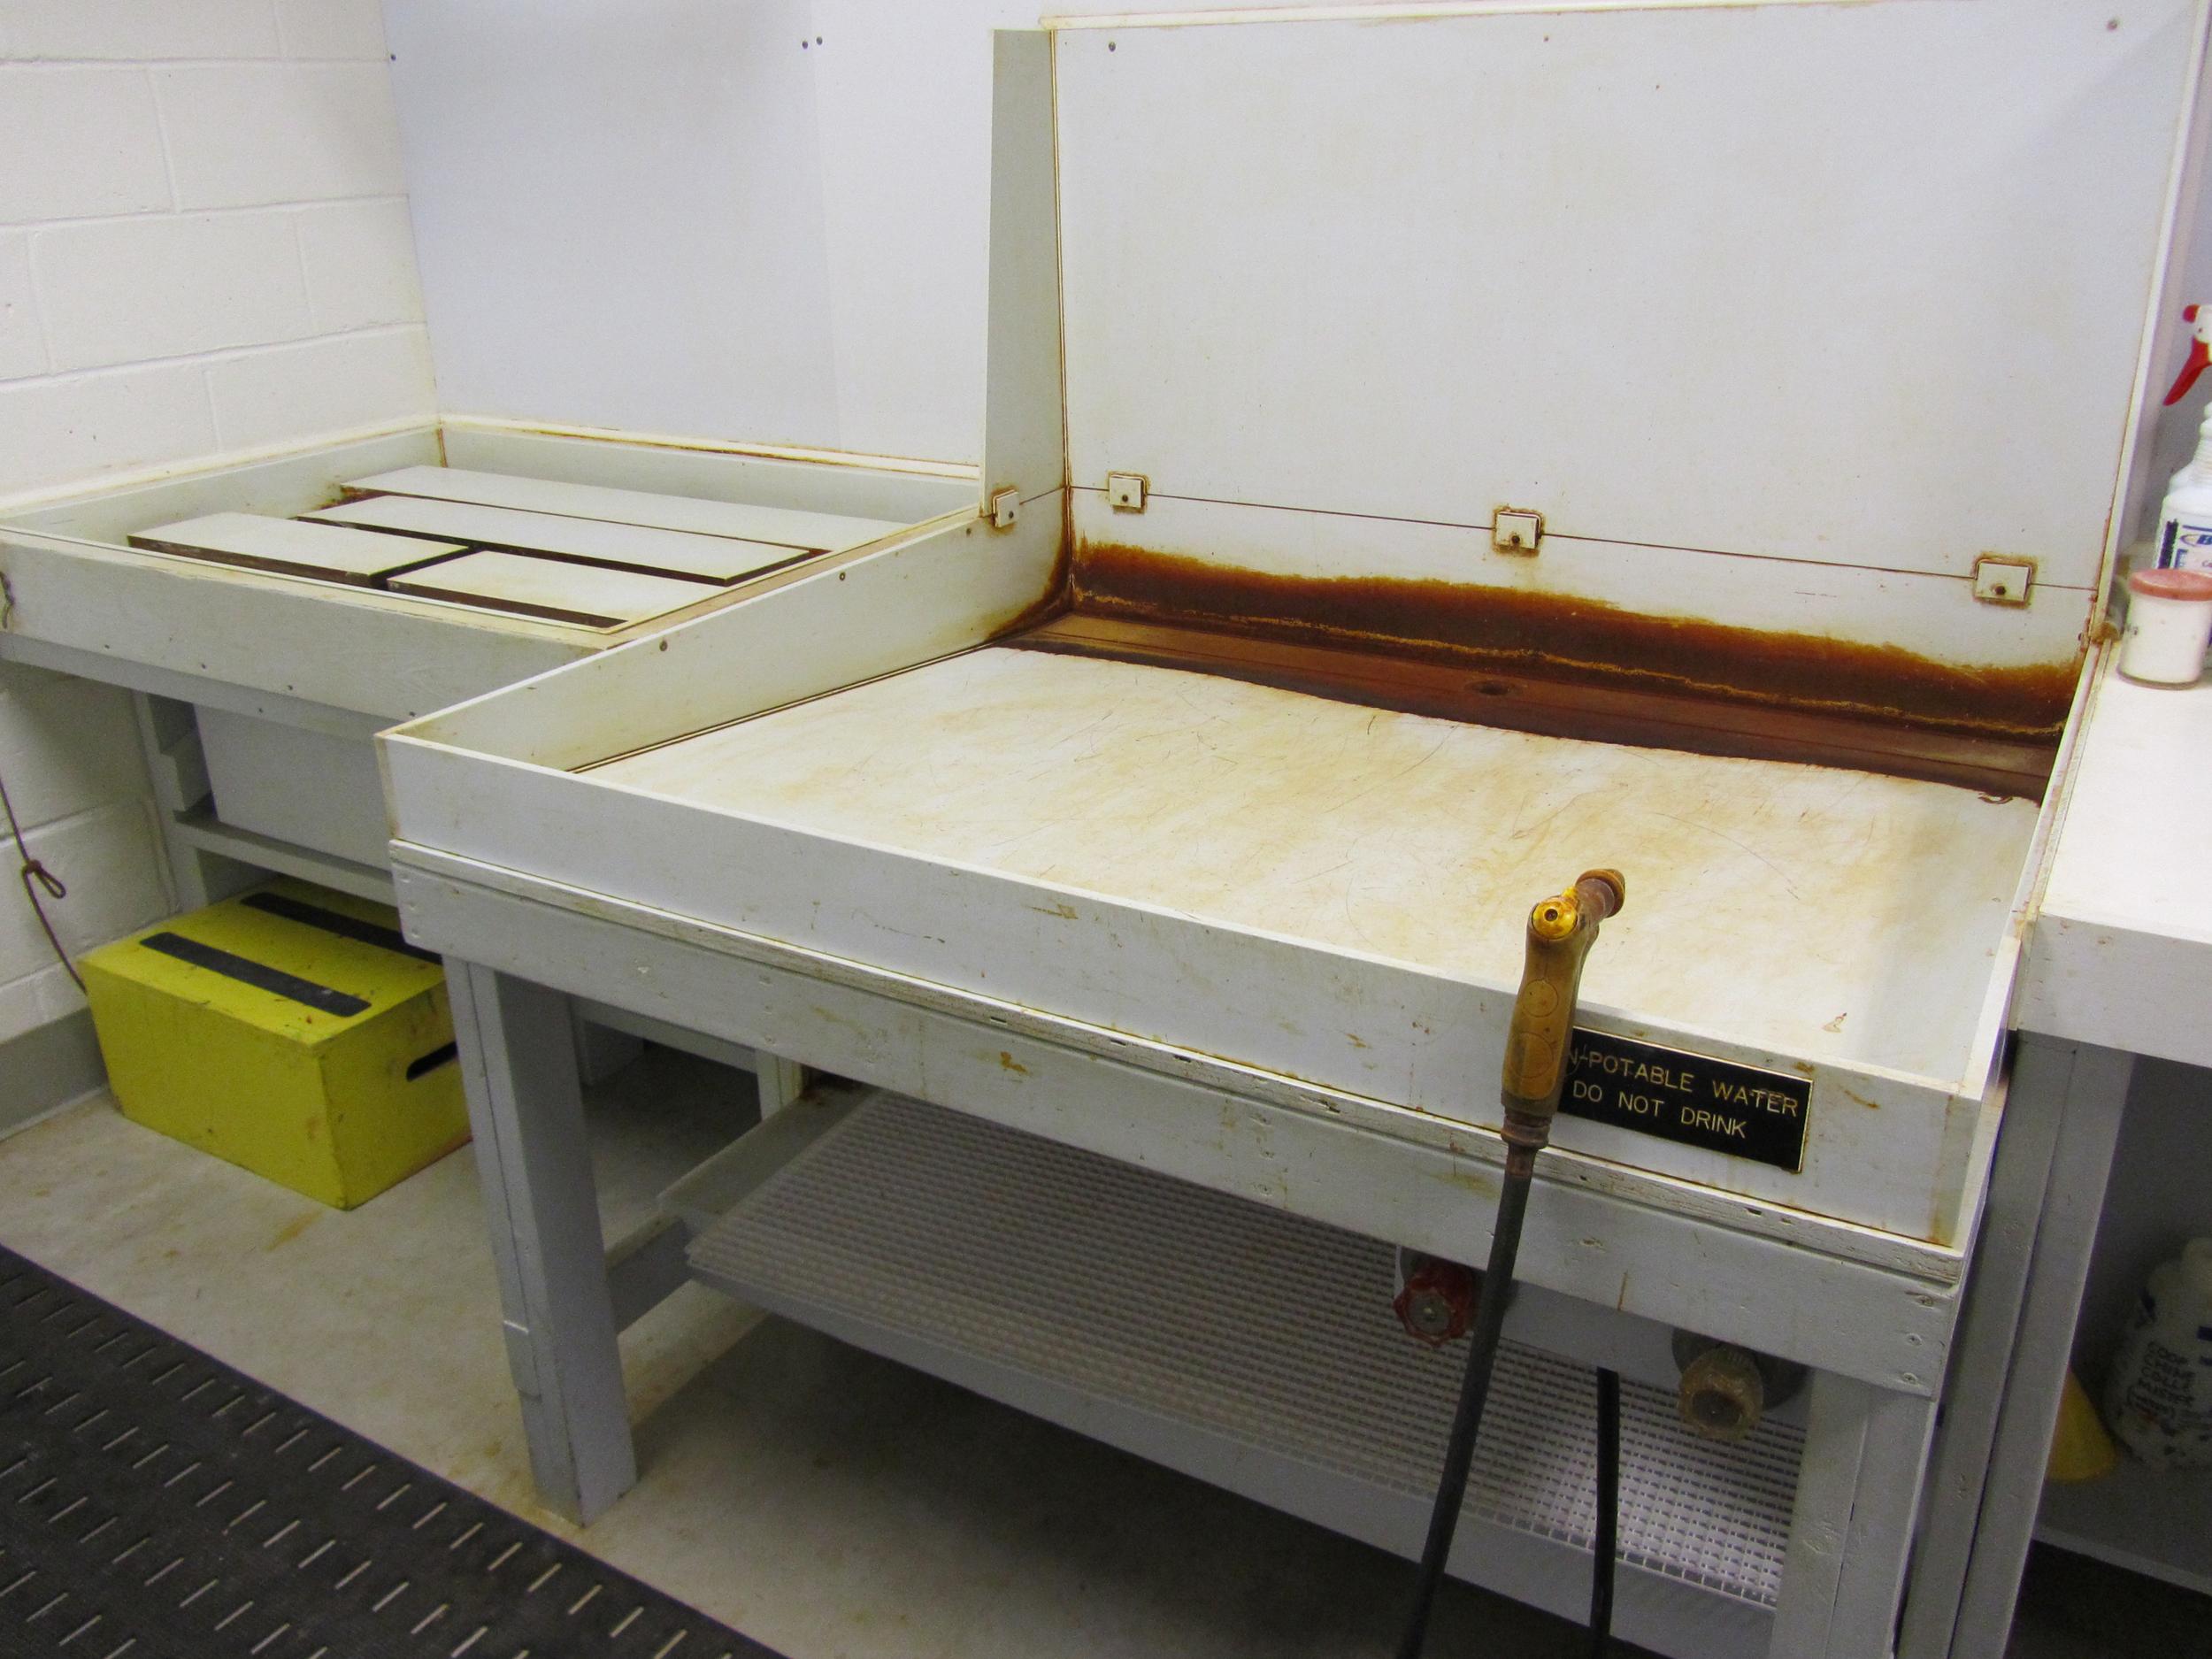 Ferric chloride baths and rinsing sink